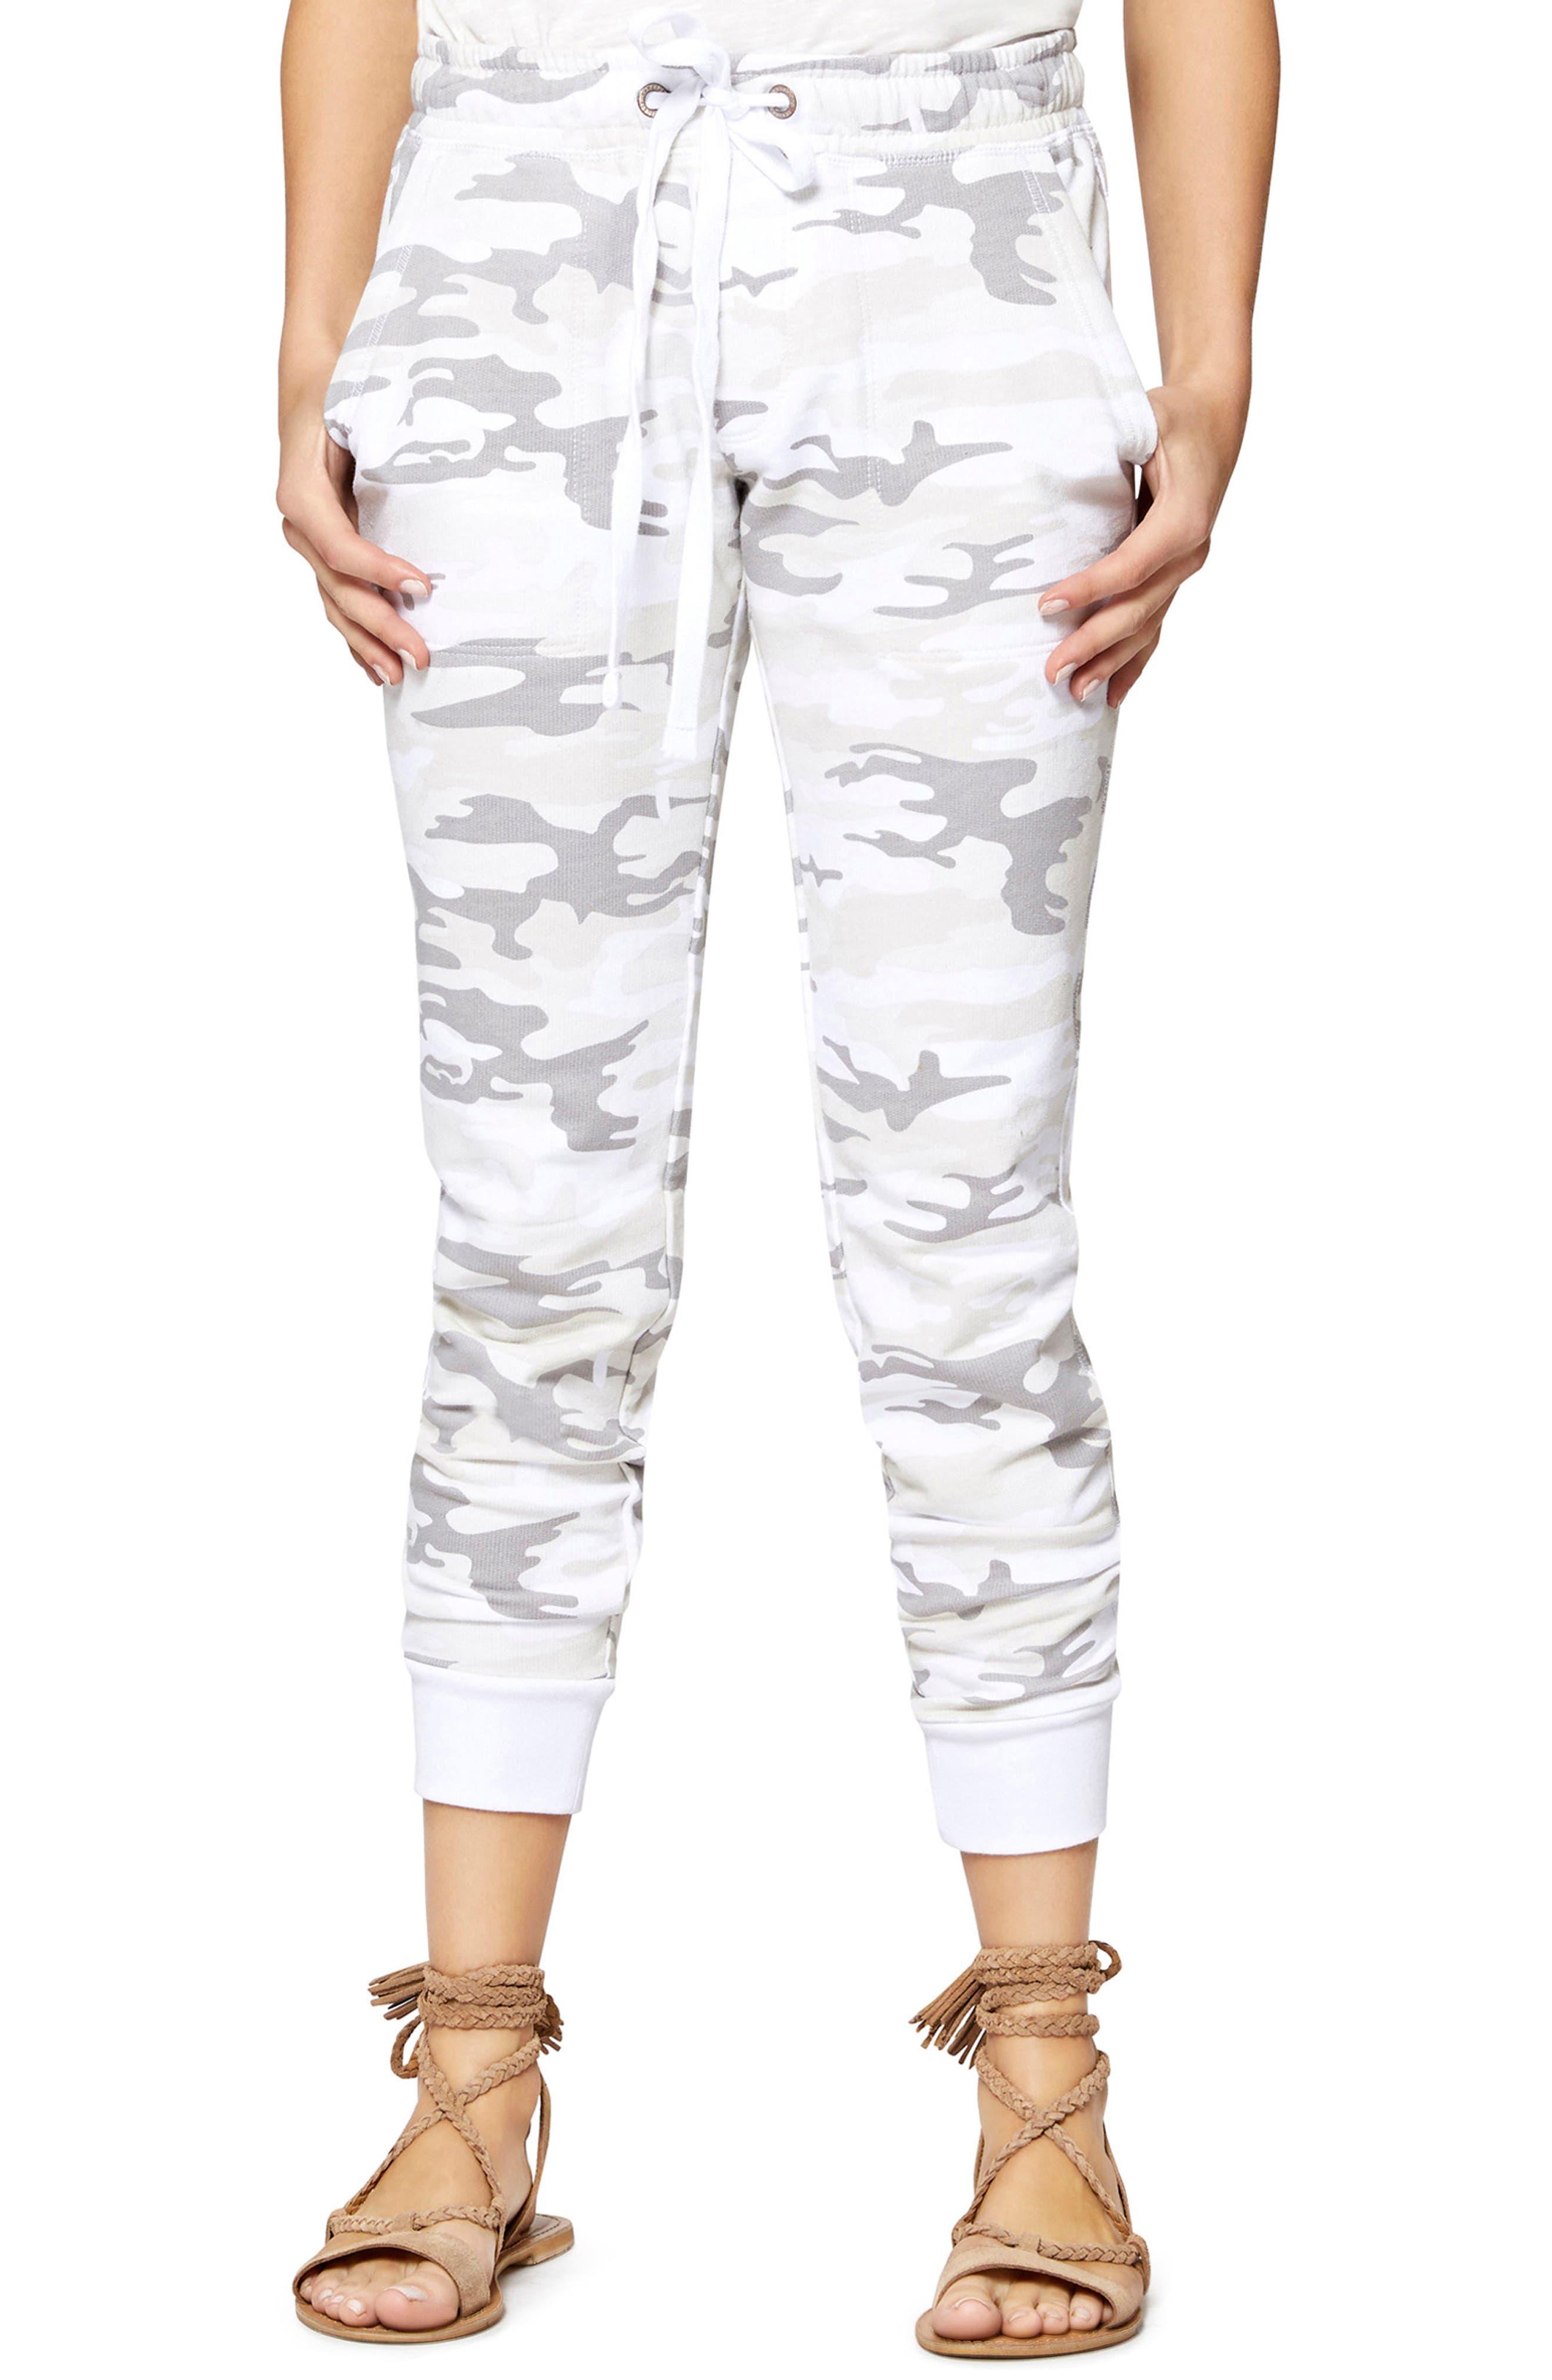 Peace Brigade Jogger Pants,                         Main,                         color, 197